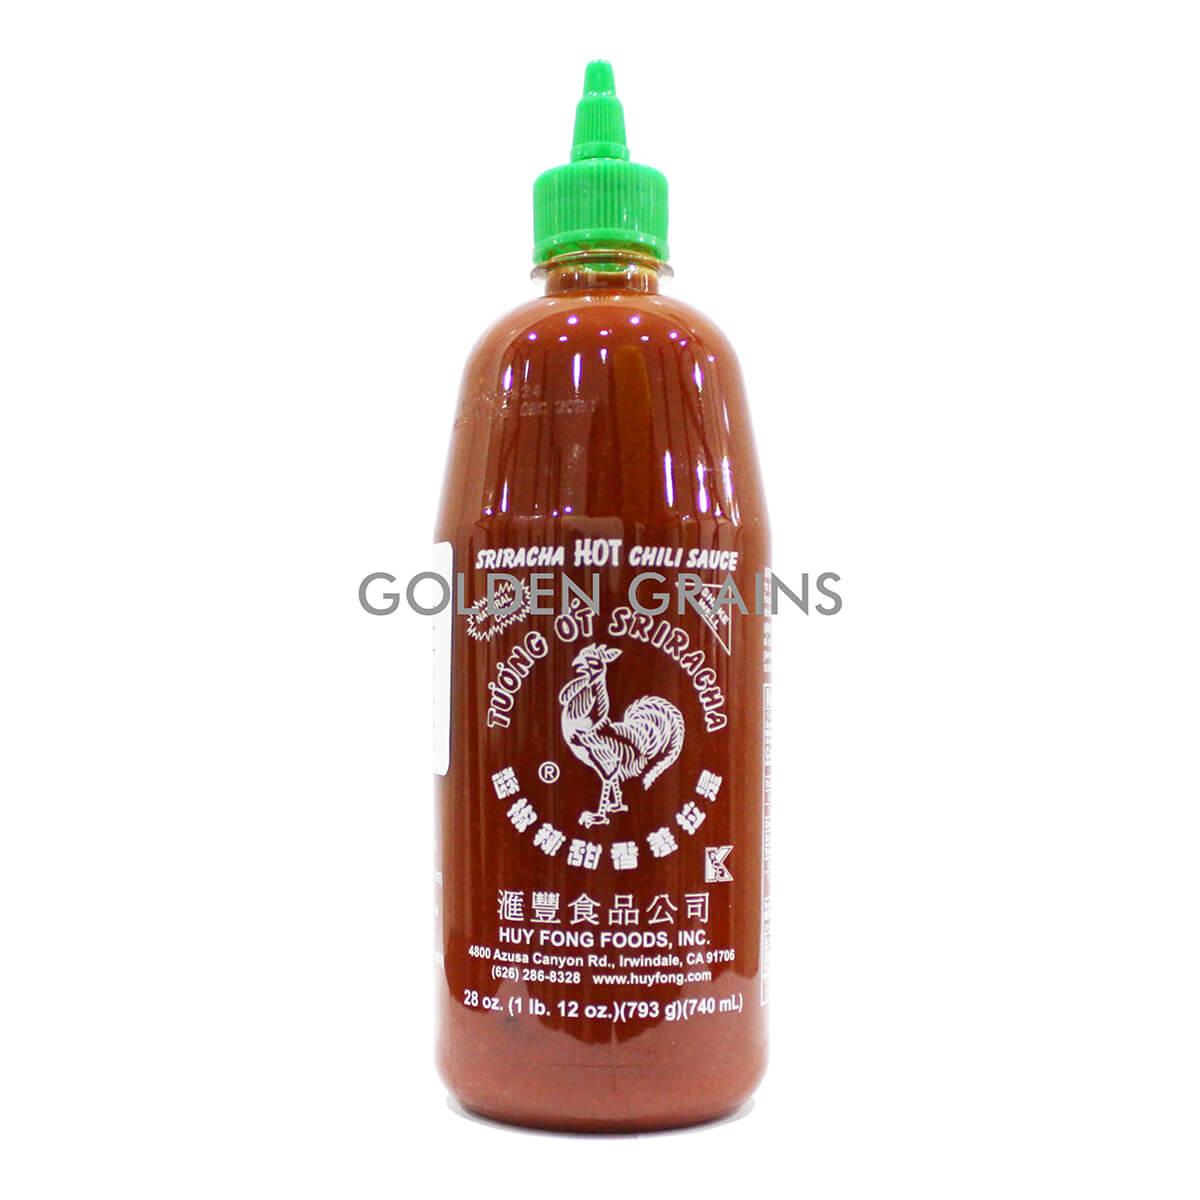 Golden Grains Huy Fong - Sriracha 793G -Front.jpg